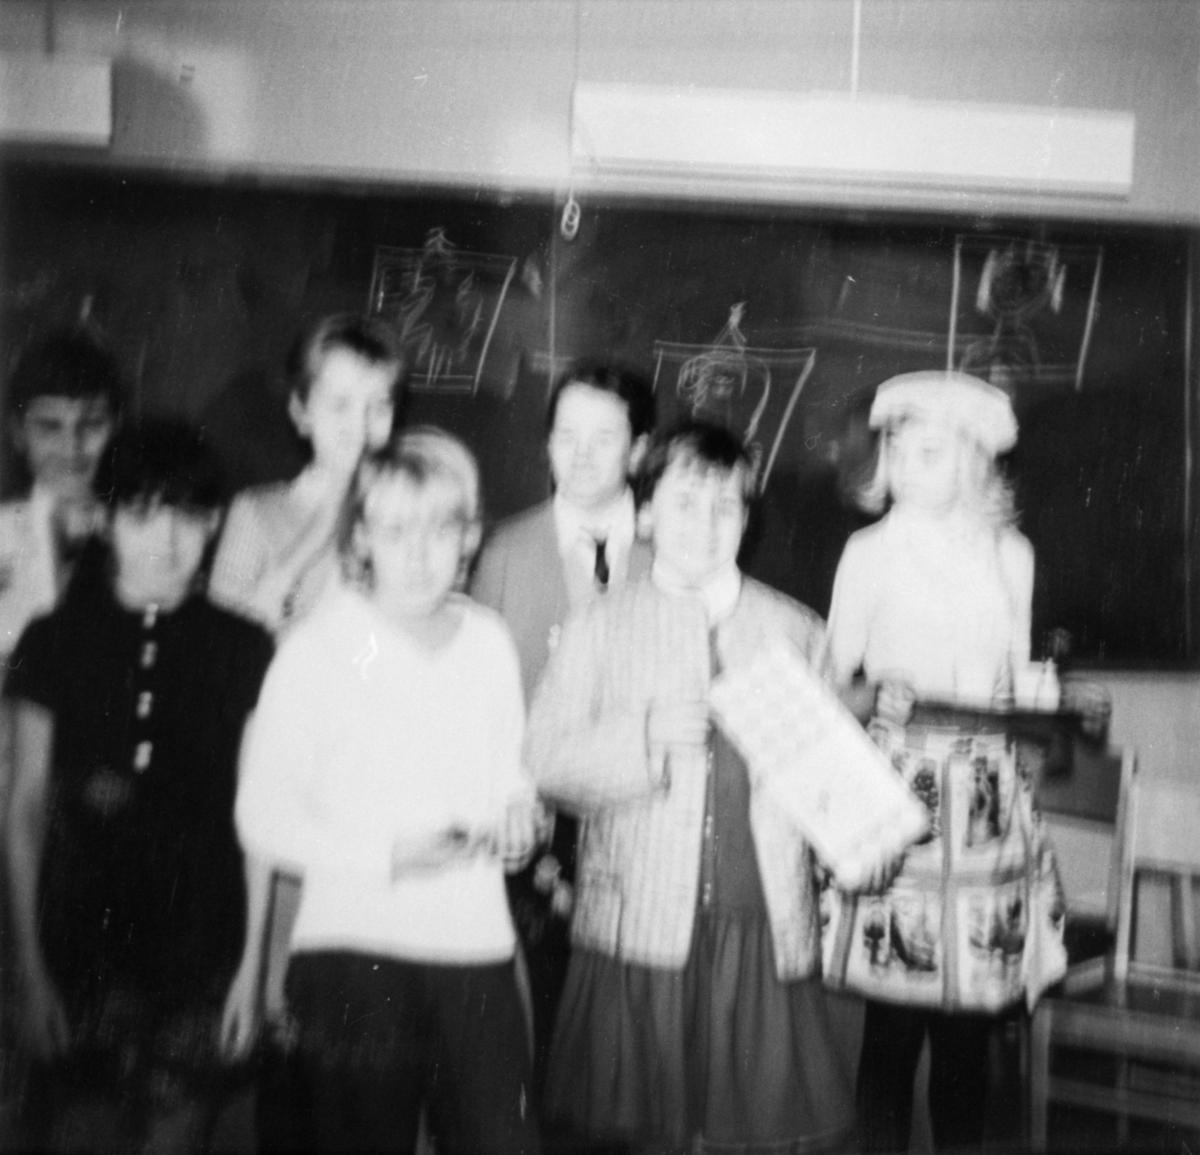 Klassens timme 4:de klass. Övre raden: Ester .W., Barbro Johansson, Birgitta. Nedre raden: Lena, Pirjo Lindfors, Maine Wennerlöw, Yvonne.